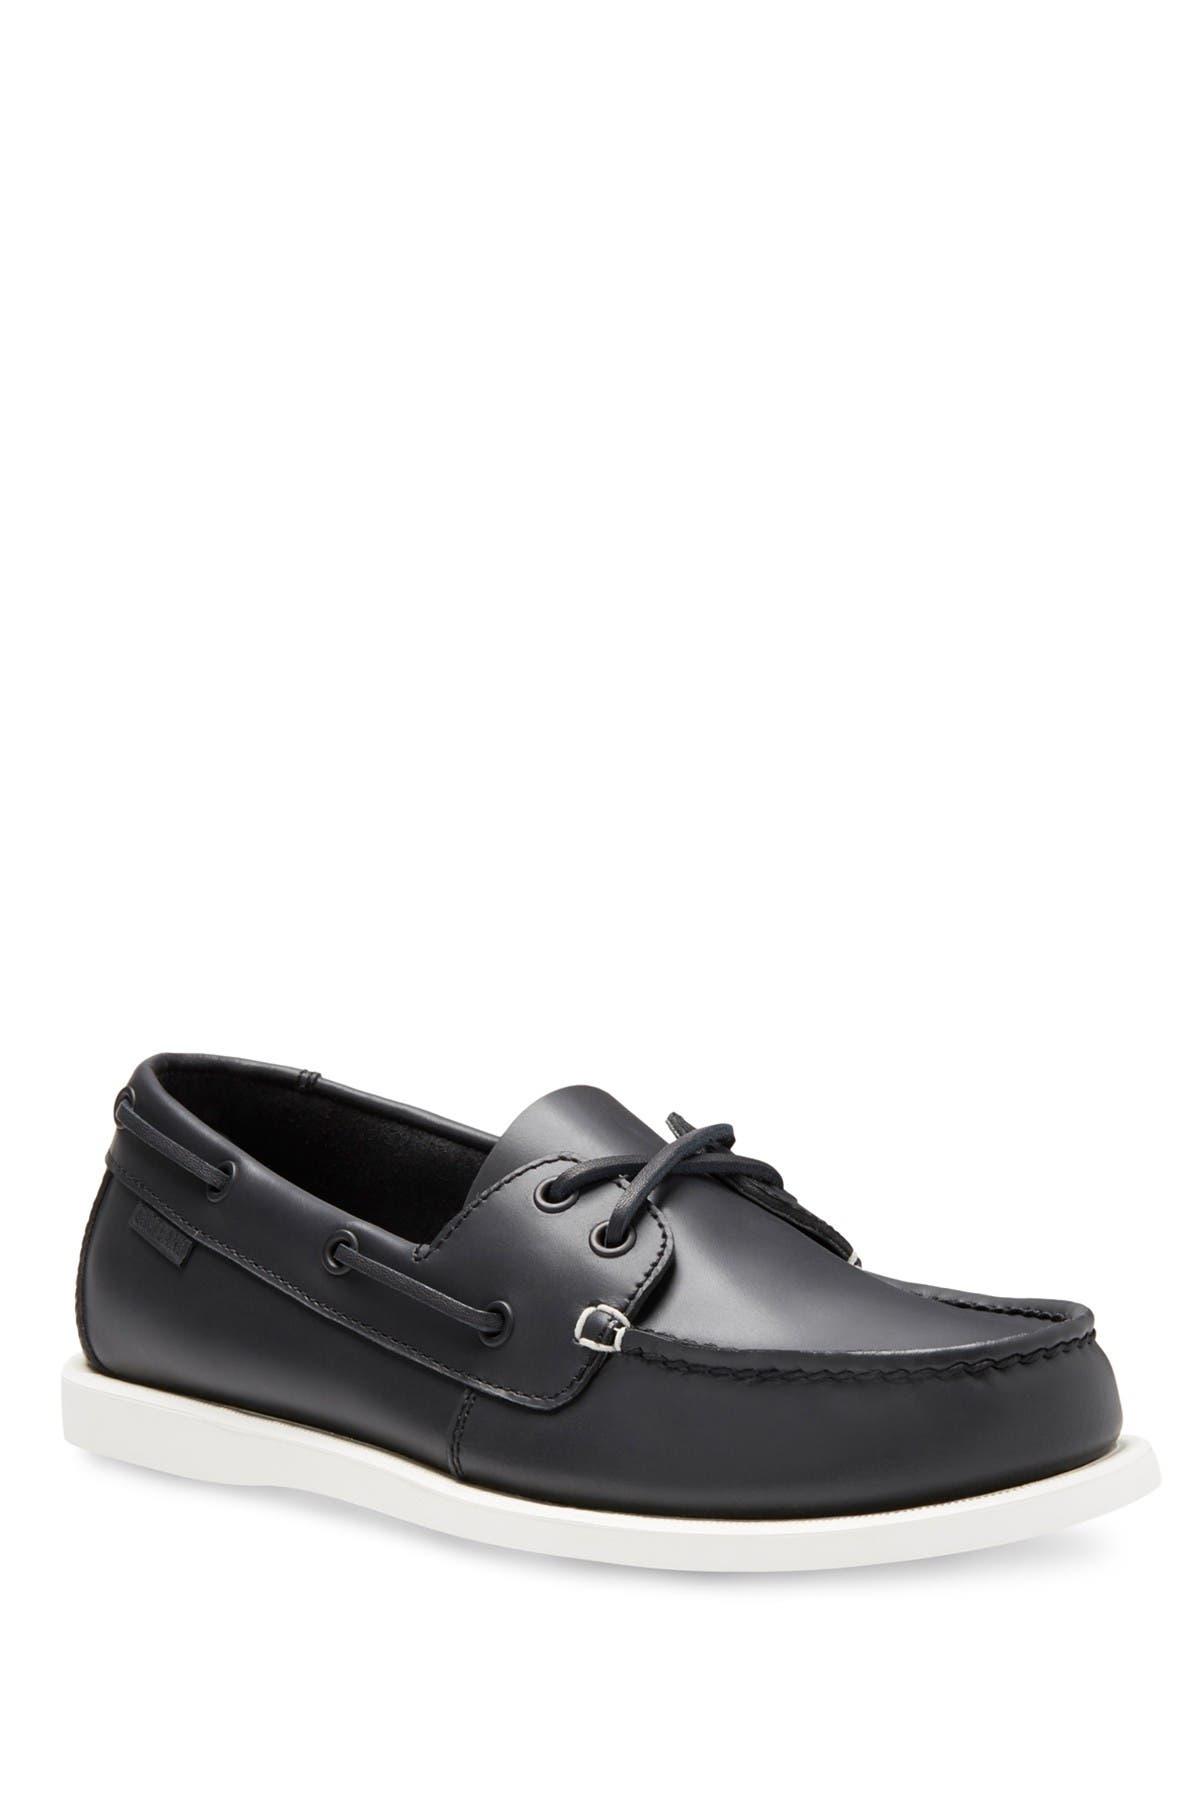 Image of Eastland Goodlife Boat Shoe